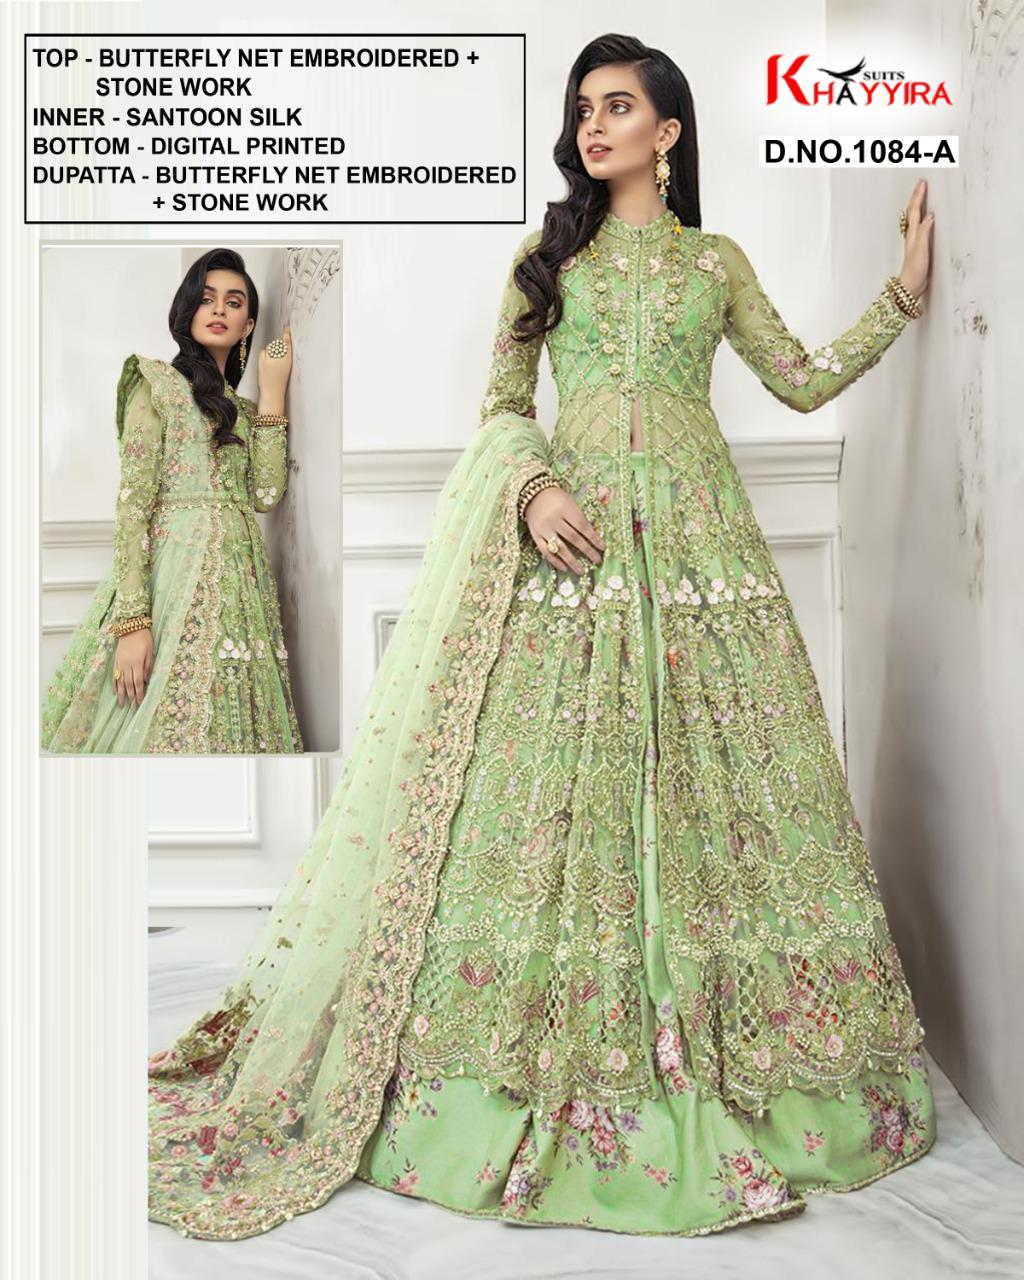 Khayyira DN 1084 Salwar Suit Wholesale Catalog 4 Pcs 3 - Khayyira DN 1084 Salwar Suit Wholesale Catalog 4 Pcs